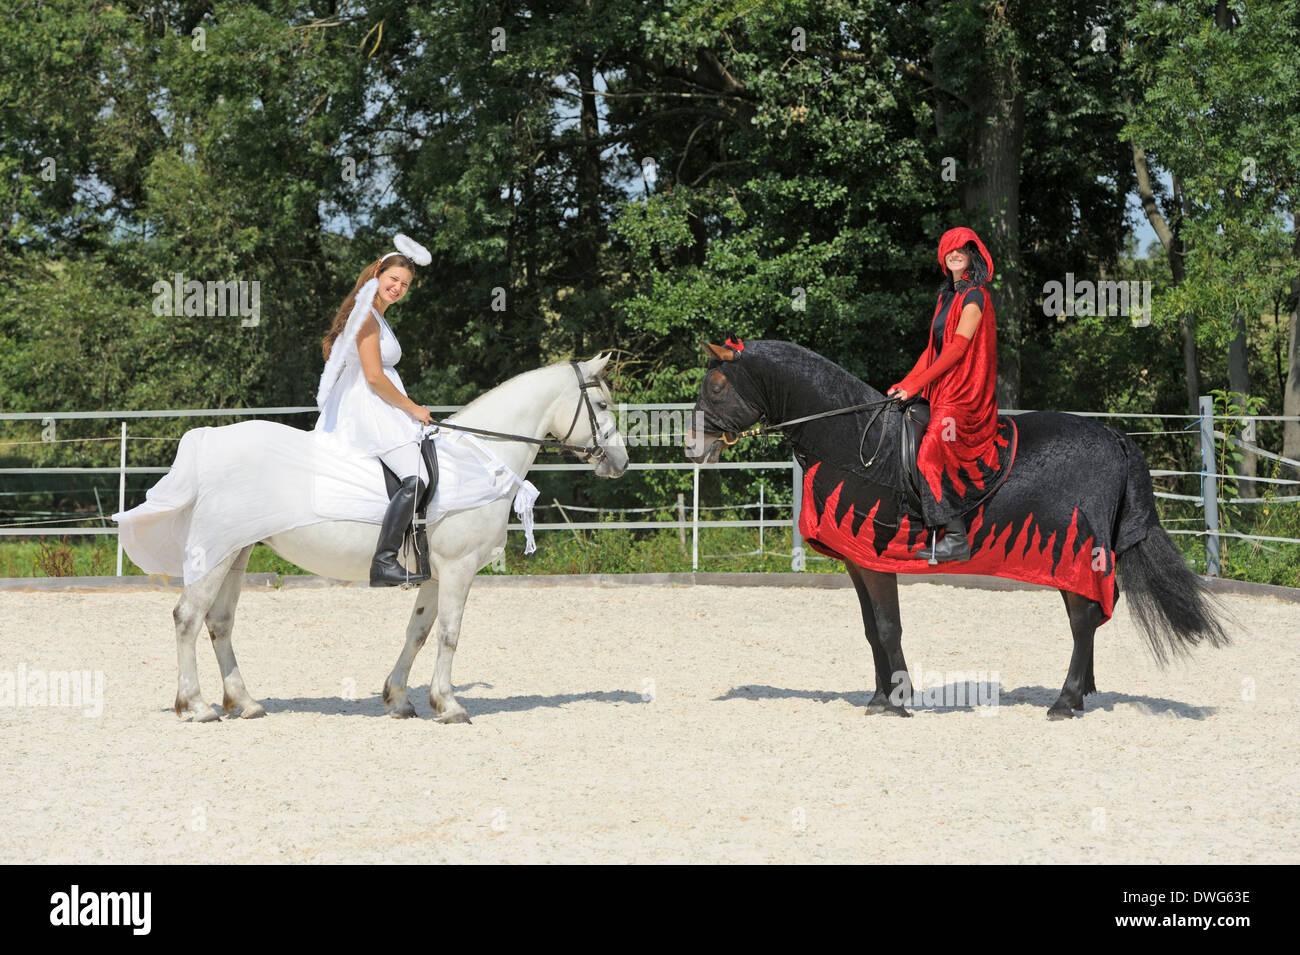 Riding Pas De Deux Angel And Devil Connemara Pony Mare And Stock Photo Alamy